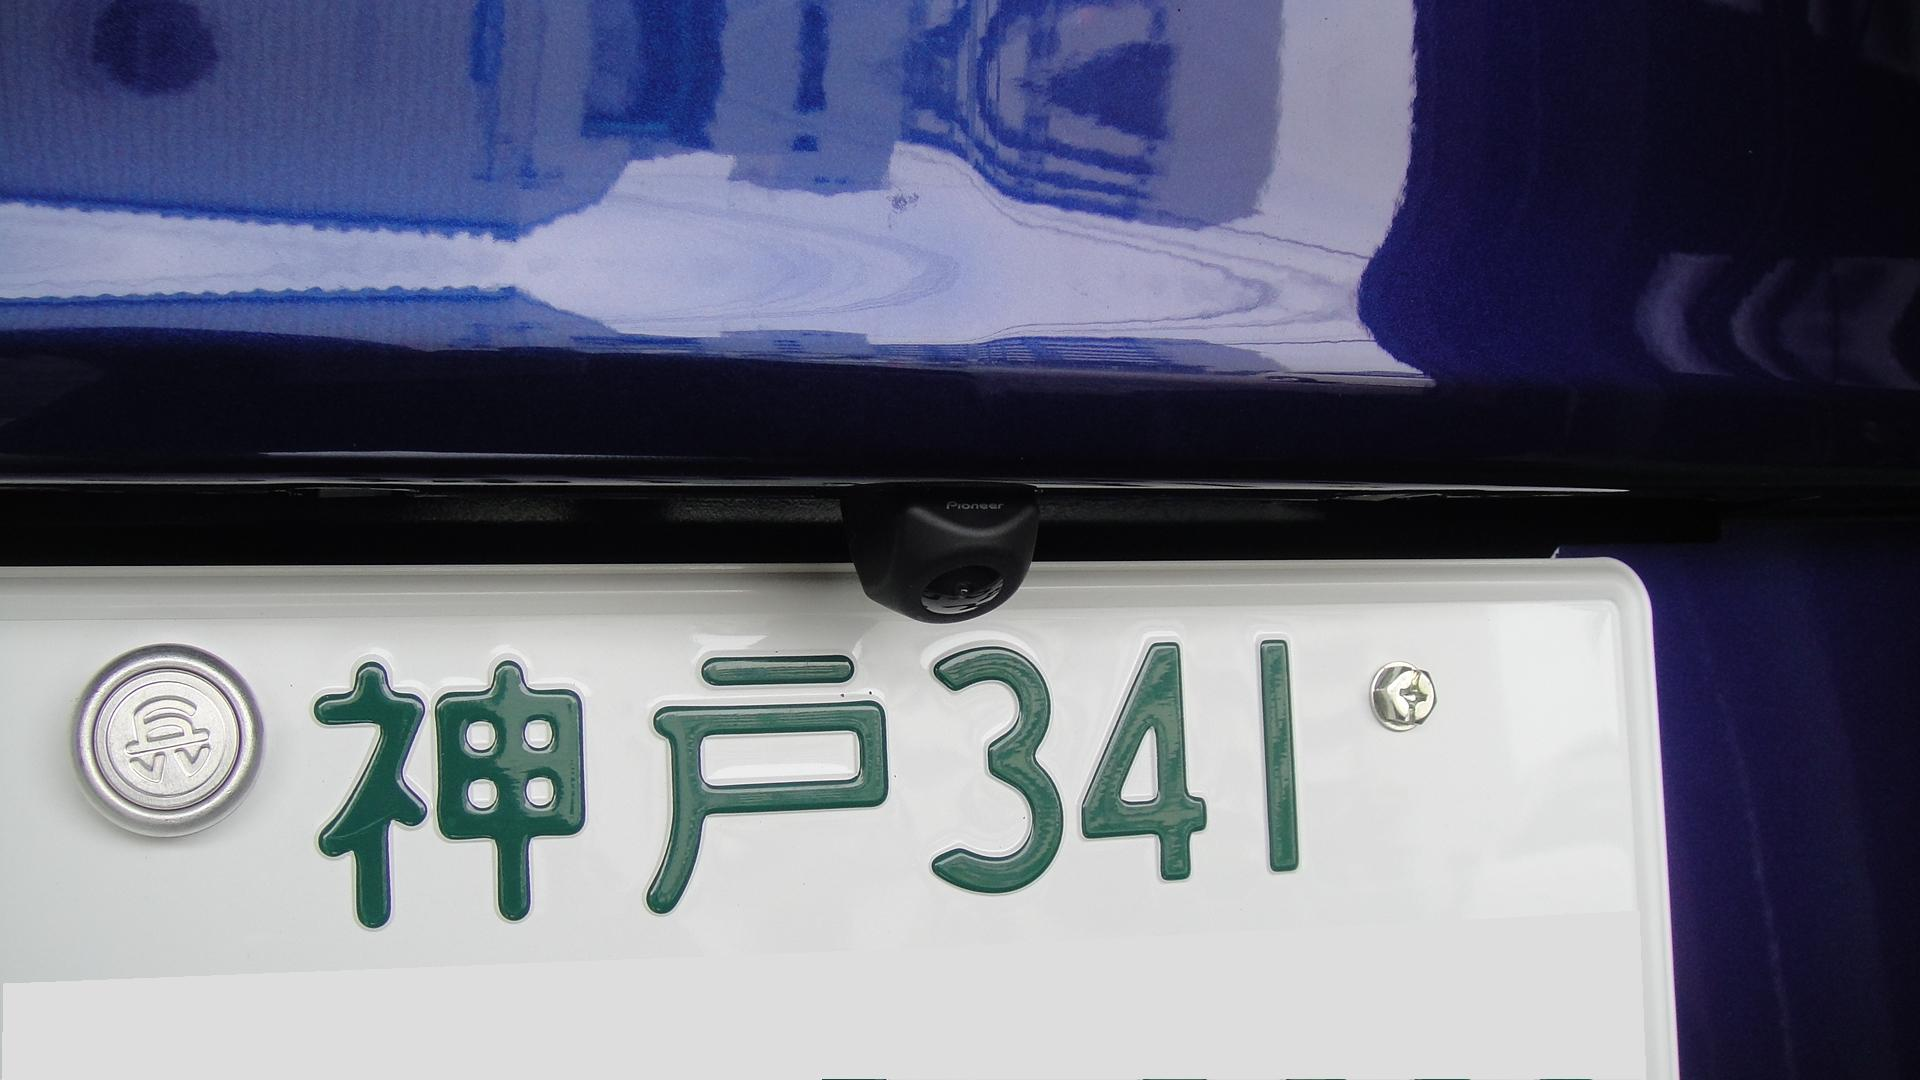 c0199344_13463616.jpg